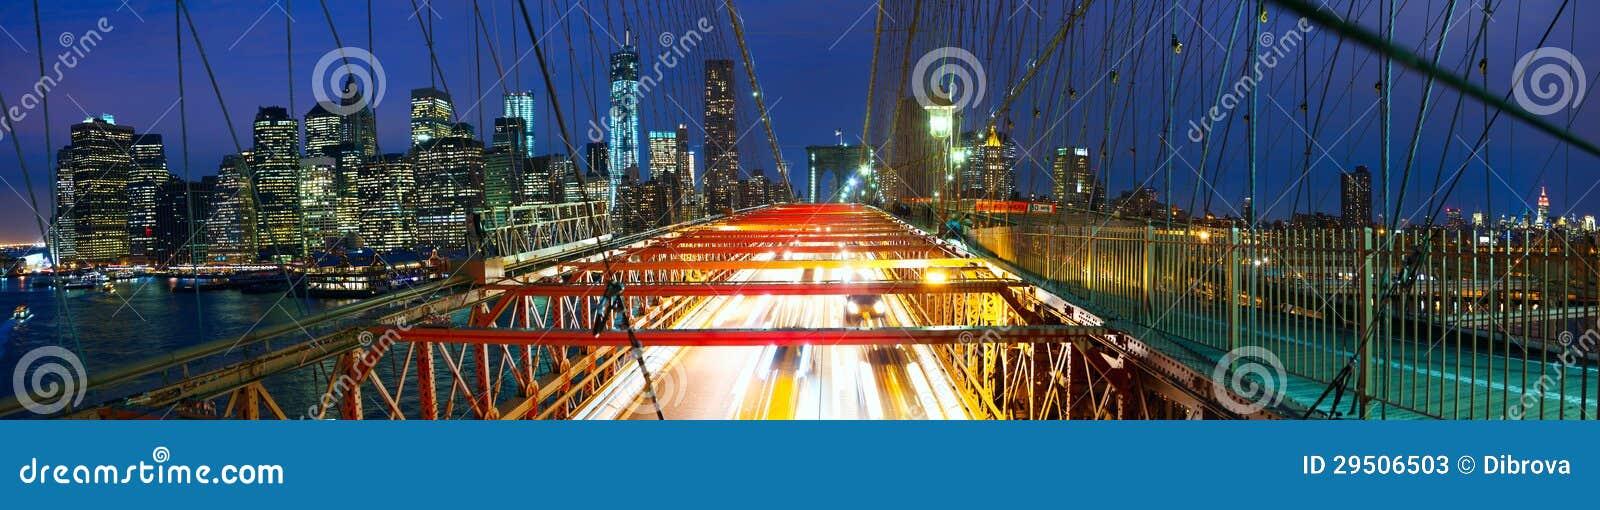 Het panorama van de Brug van Brooklyn met verkeer